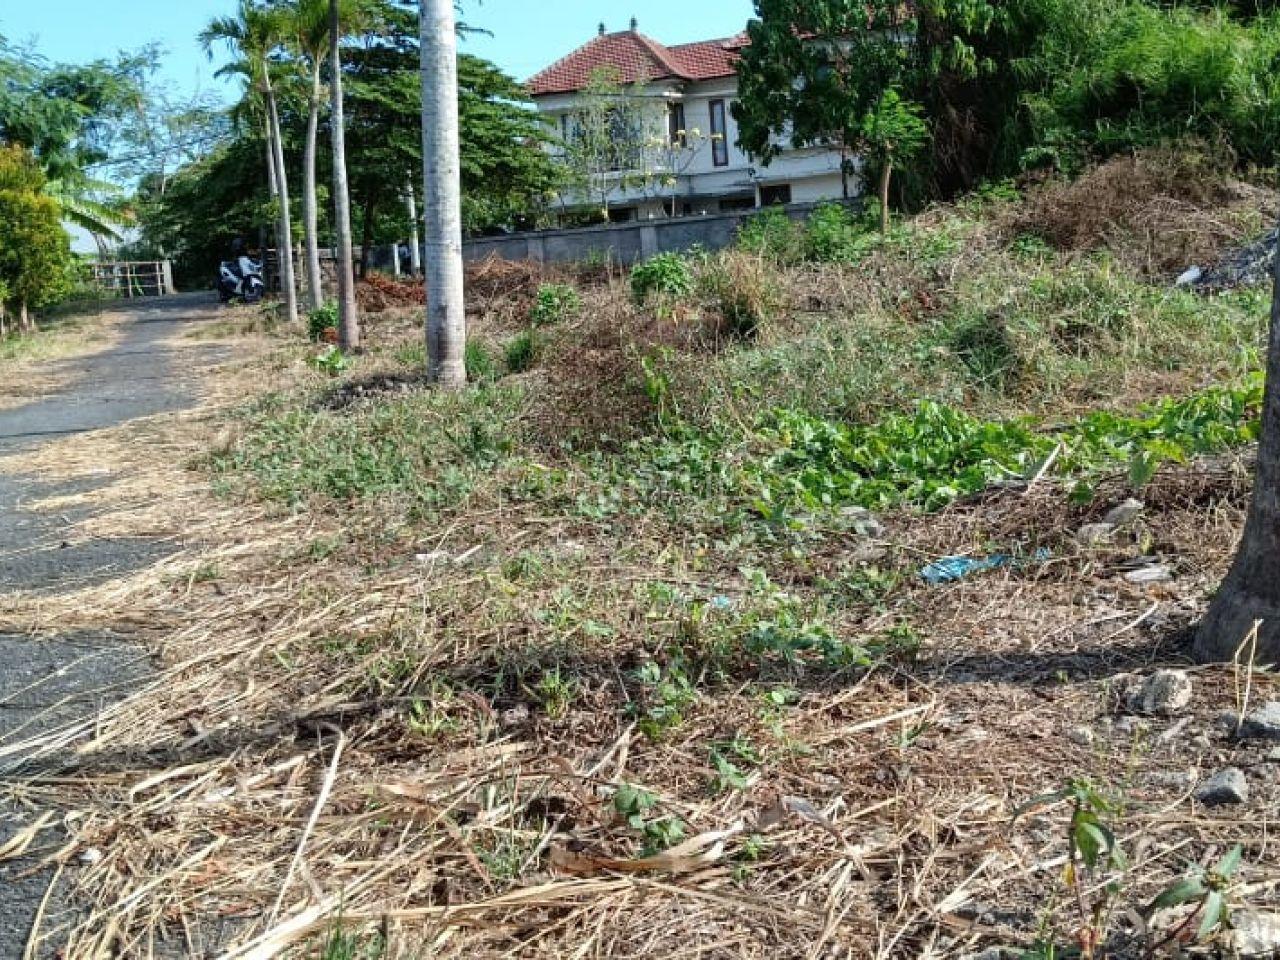 Tanah dengan Posisi Hook di Kawasan Wisata Seminyak, Bali